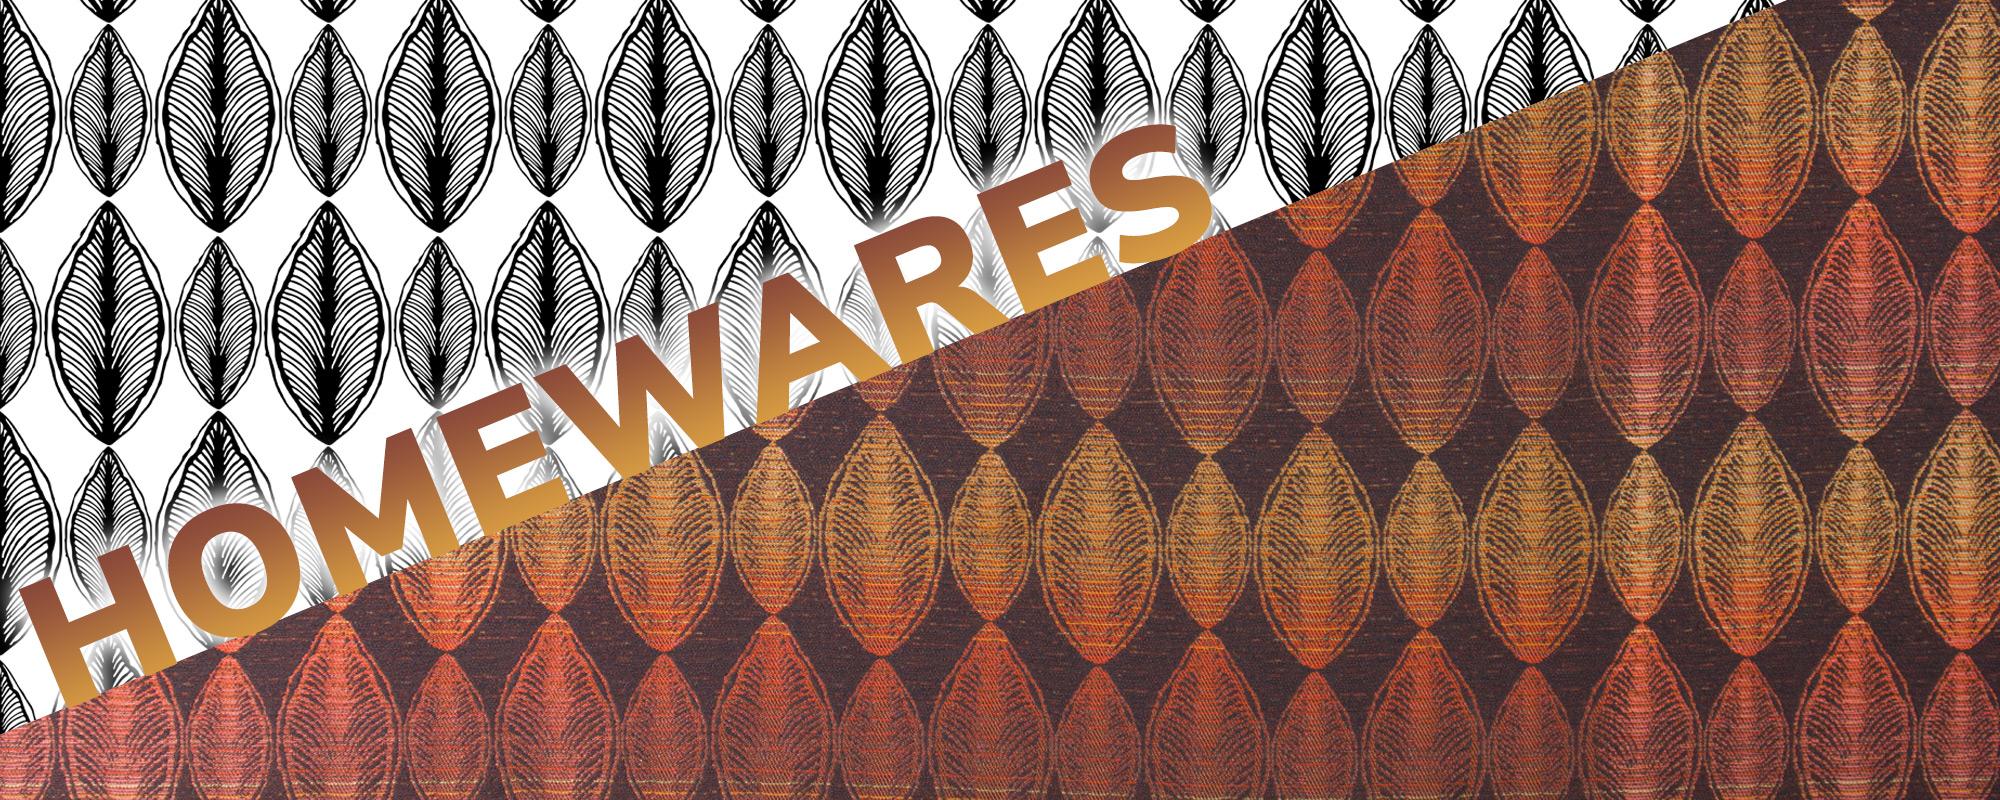 maruca_design_category_homeware-banner.jpg